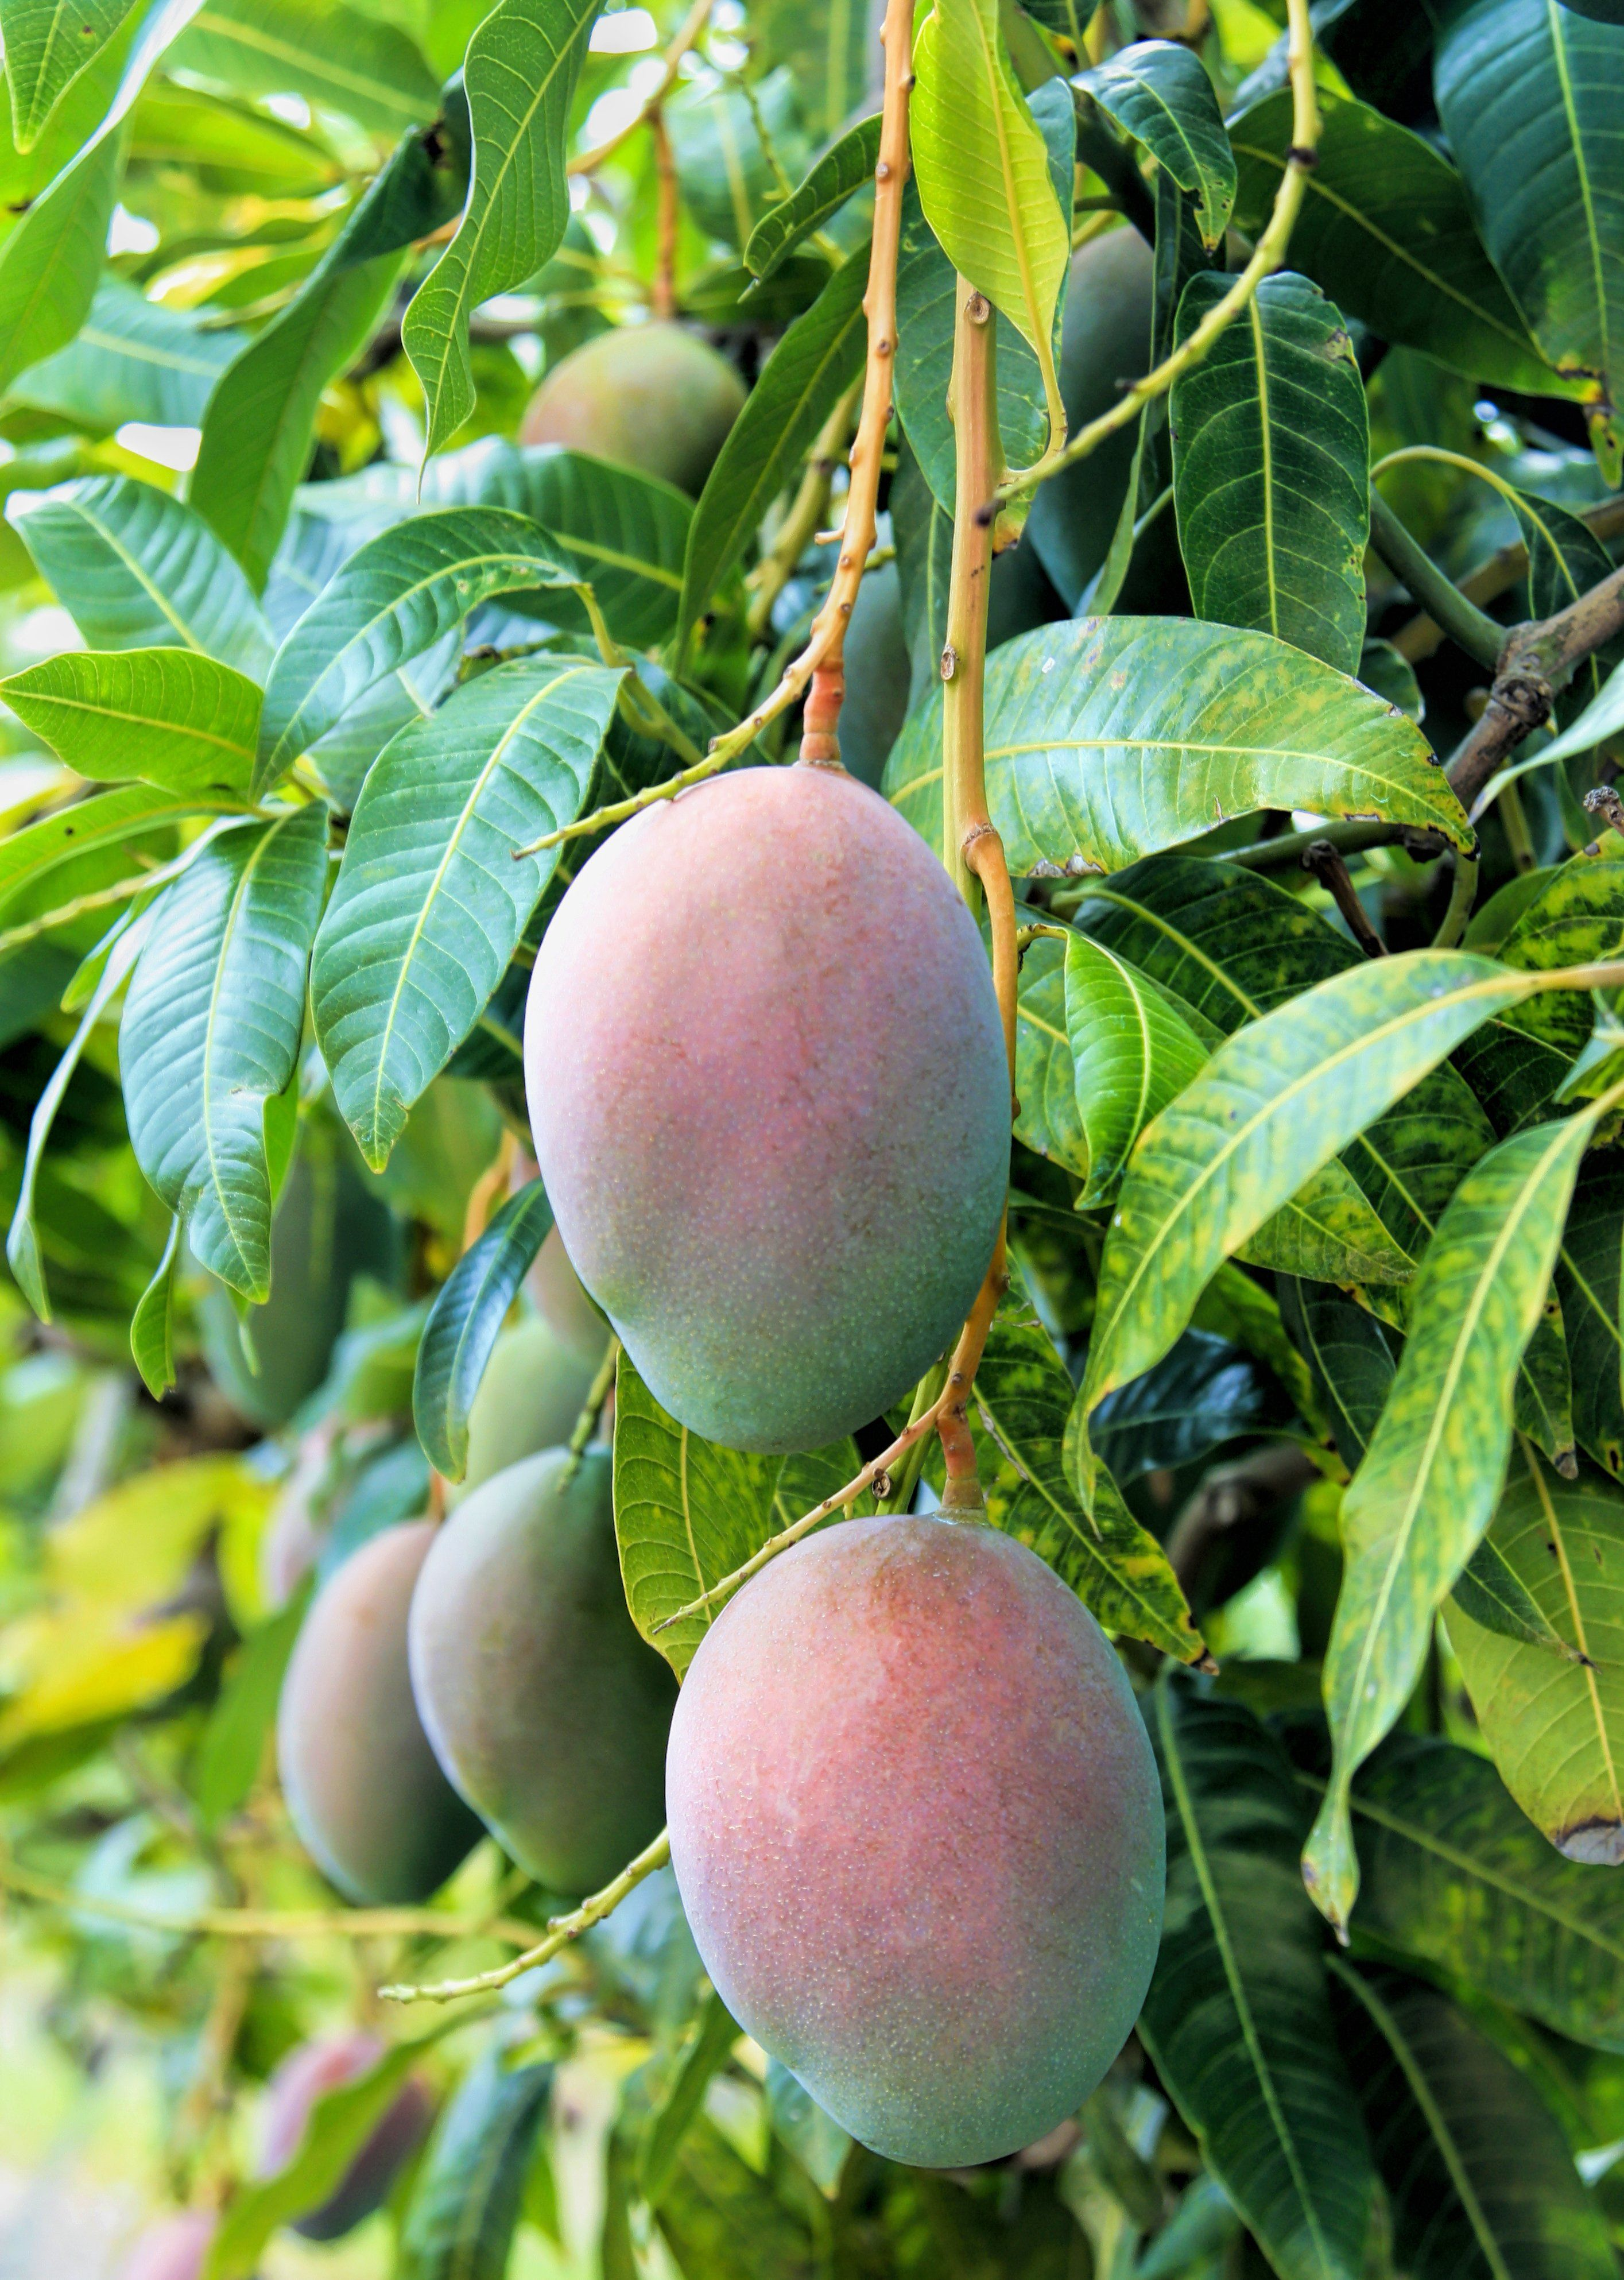 Mango Pickering Mangifera Indica Fruit Trees Fast Growing Trees Mango